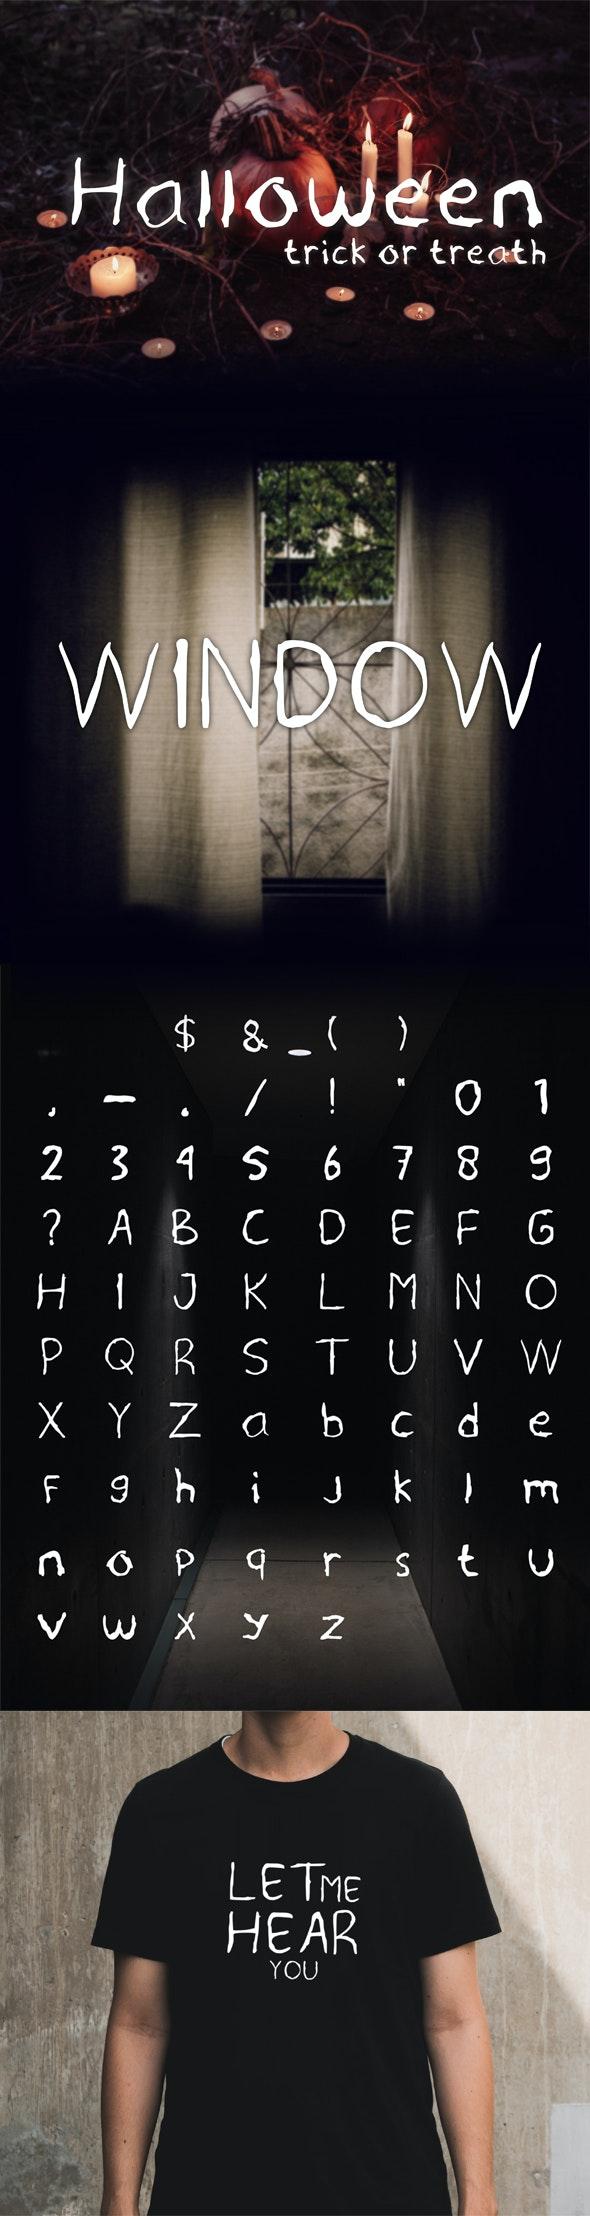 Halloween Nikov Fonts - Fonts